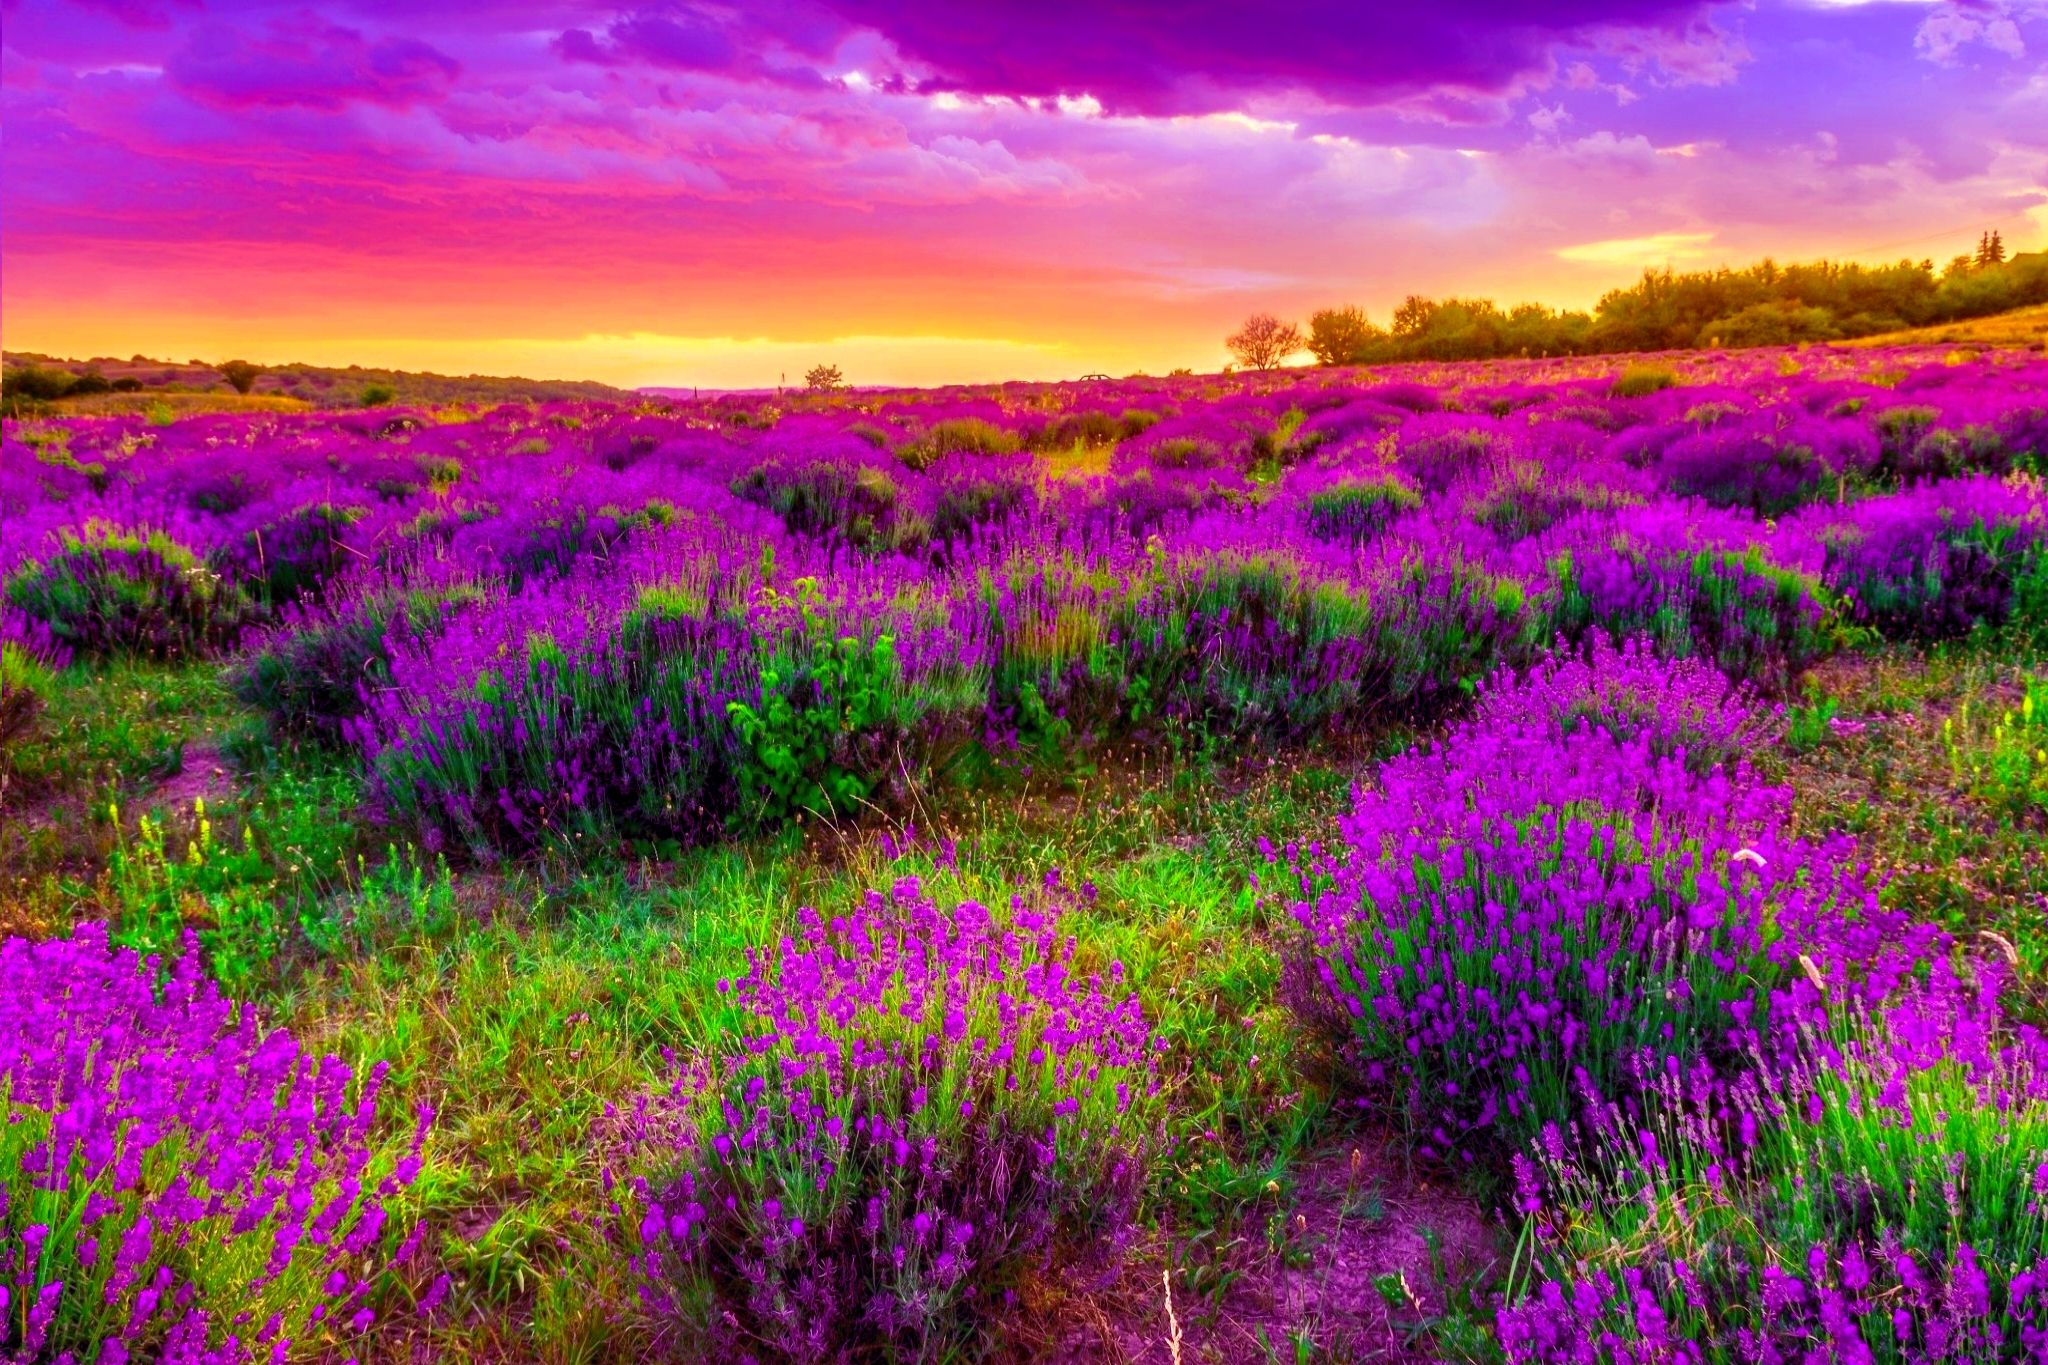 Beautiful Spring Background 19092 2048x1365 px 2048x1365